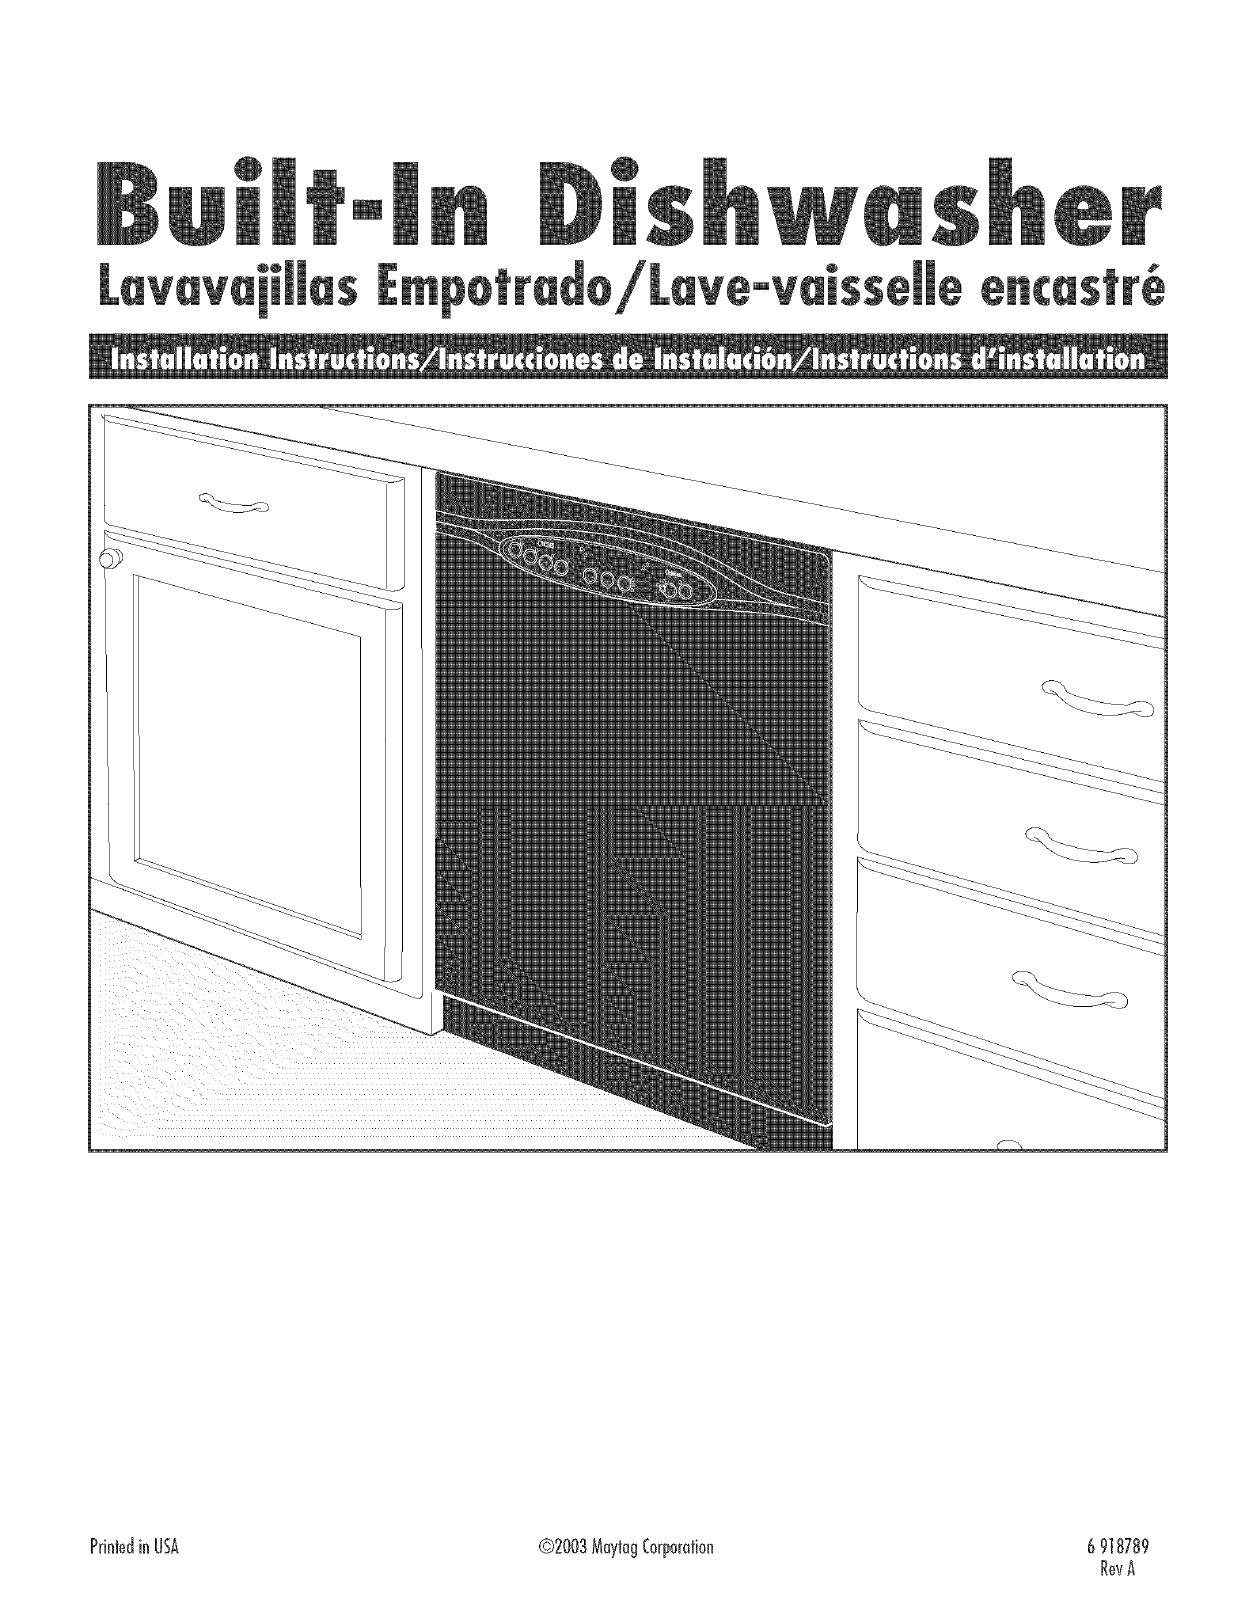 Amana Dishwasher Wiring Diagram